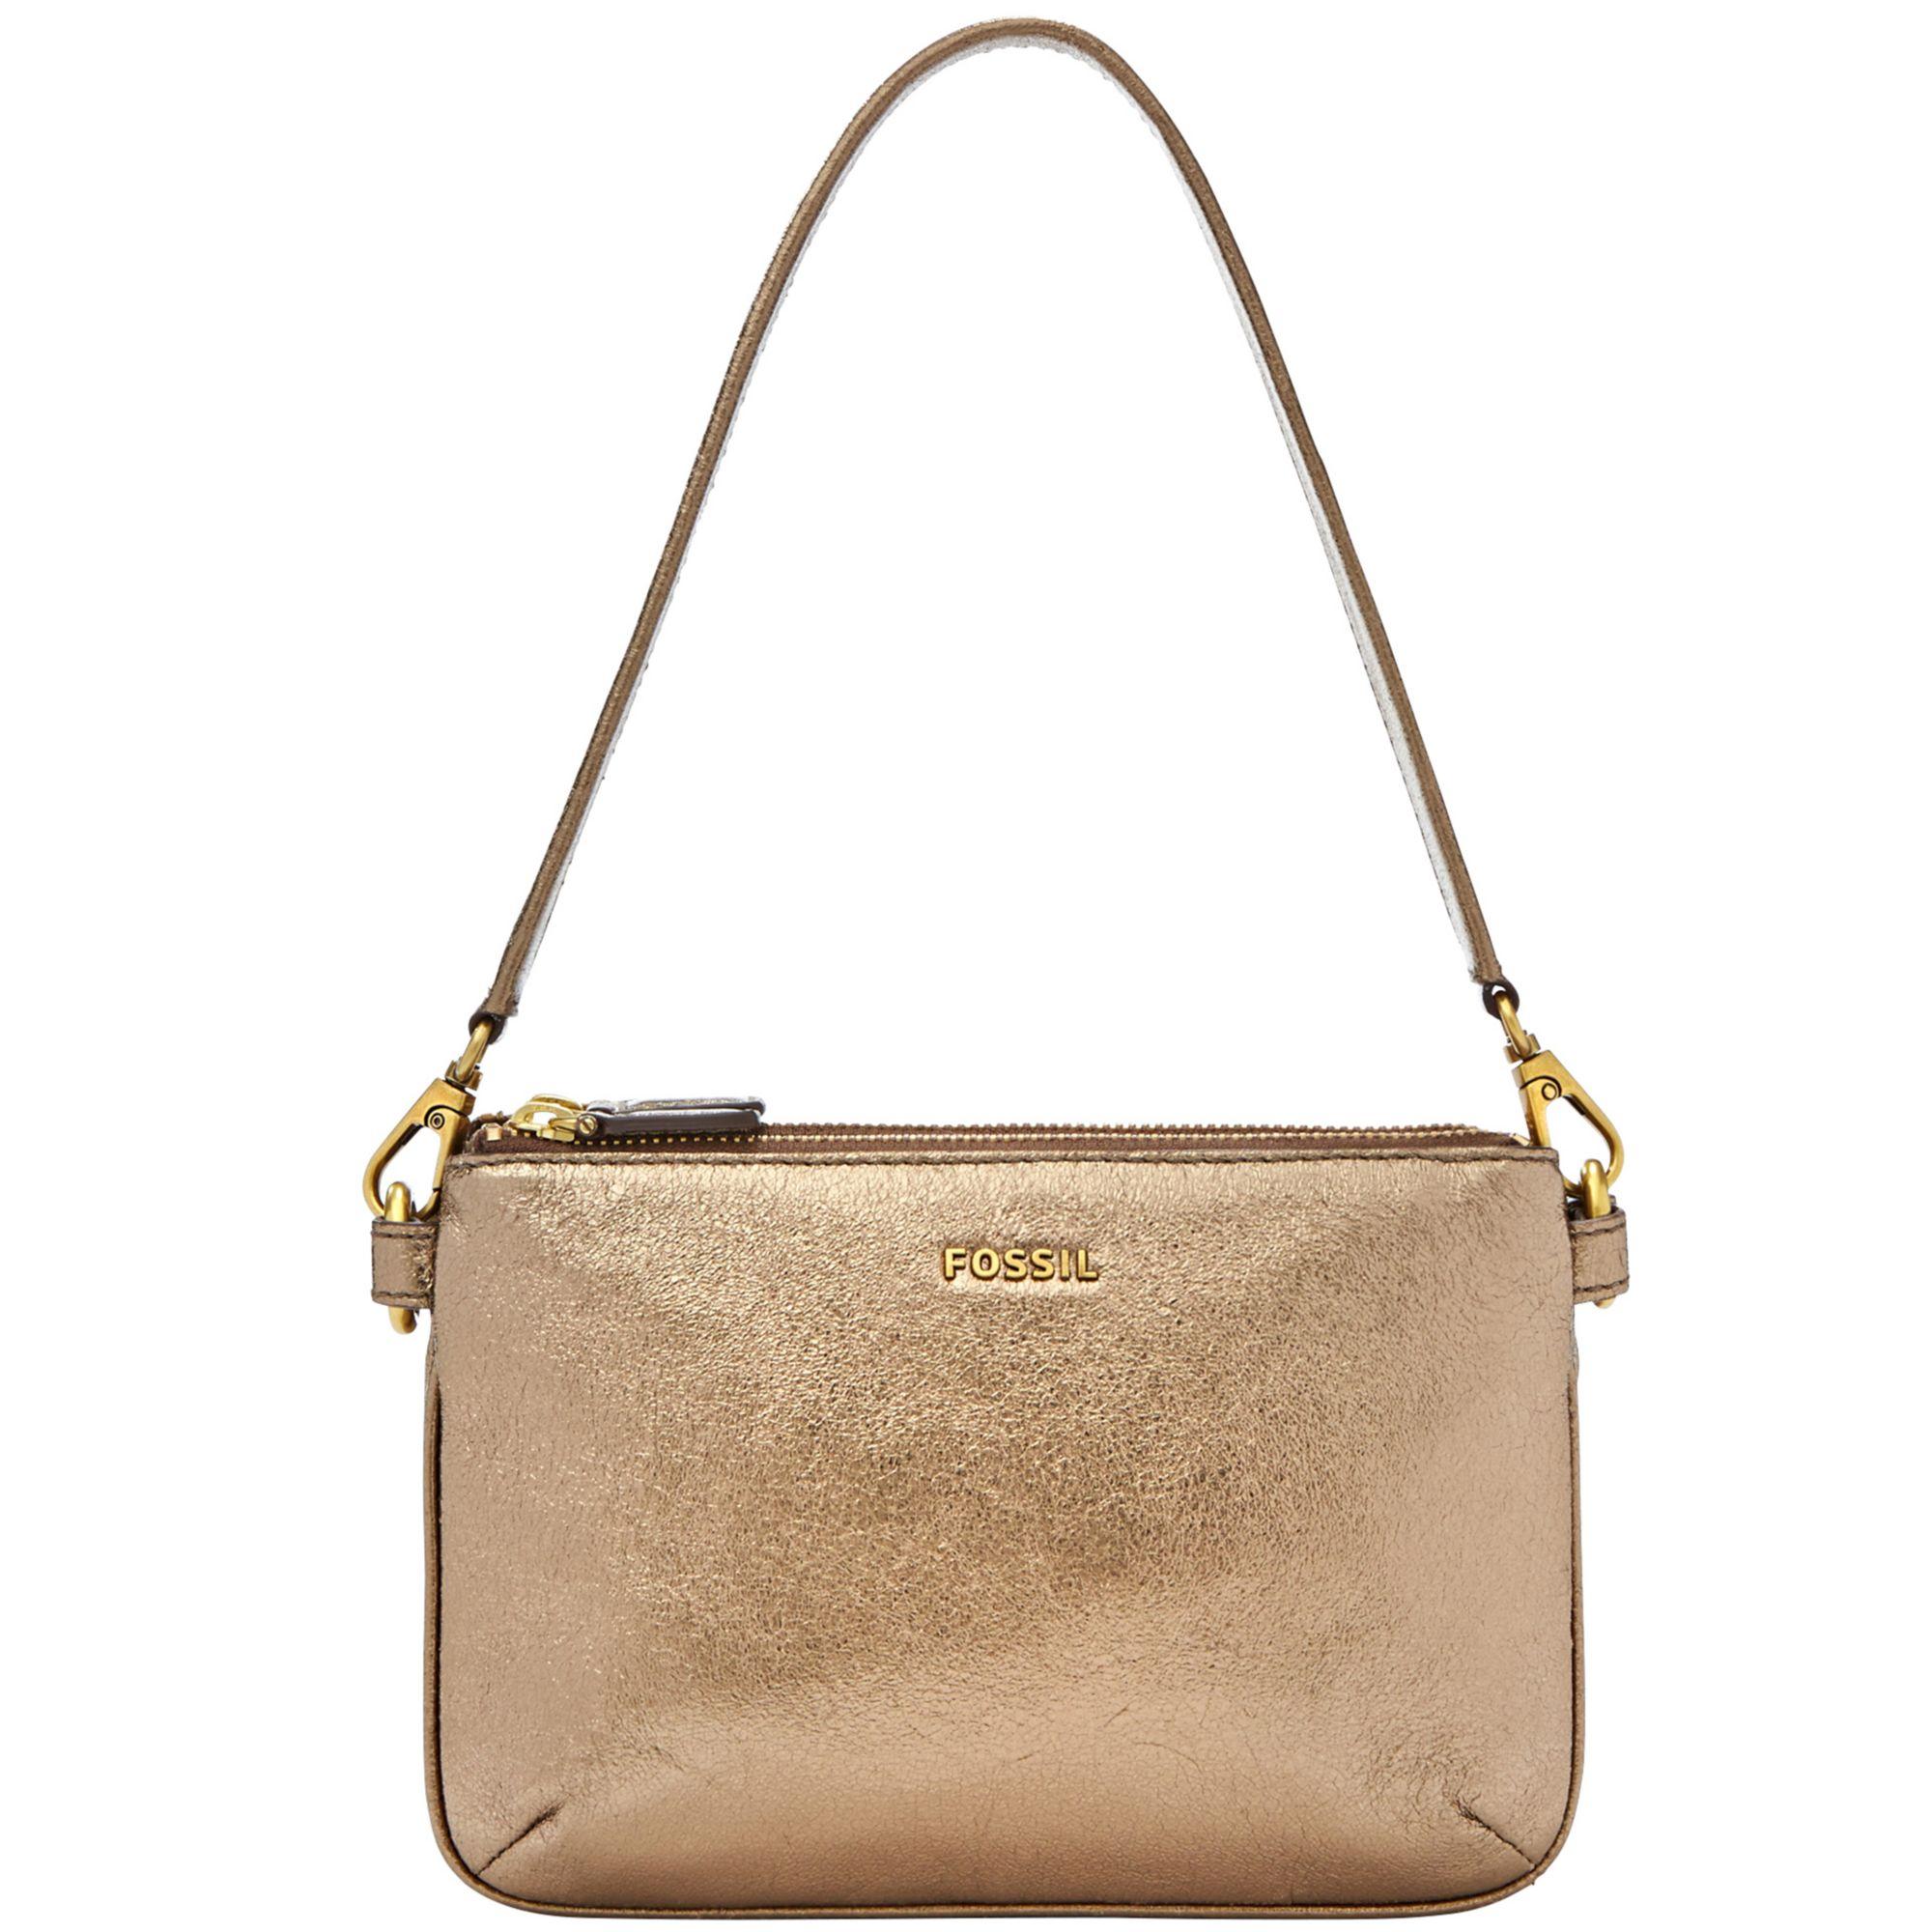 Fossil Memoir Leather Pocketbook Top Zip Shoulder Bag in Metallic ...